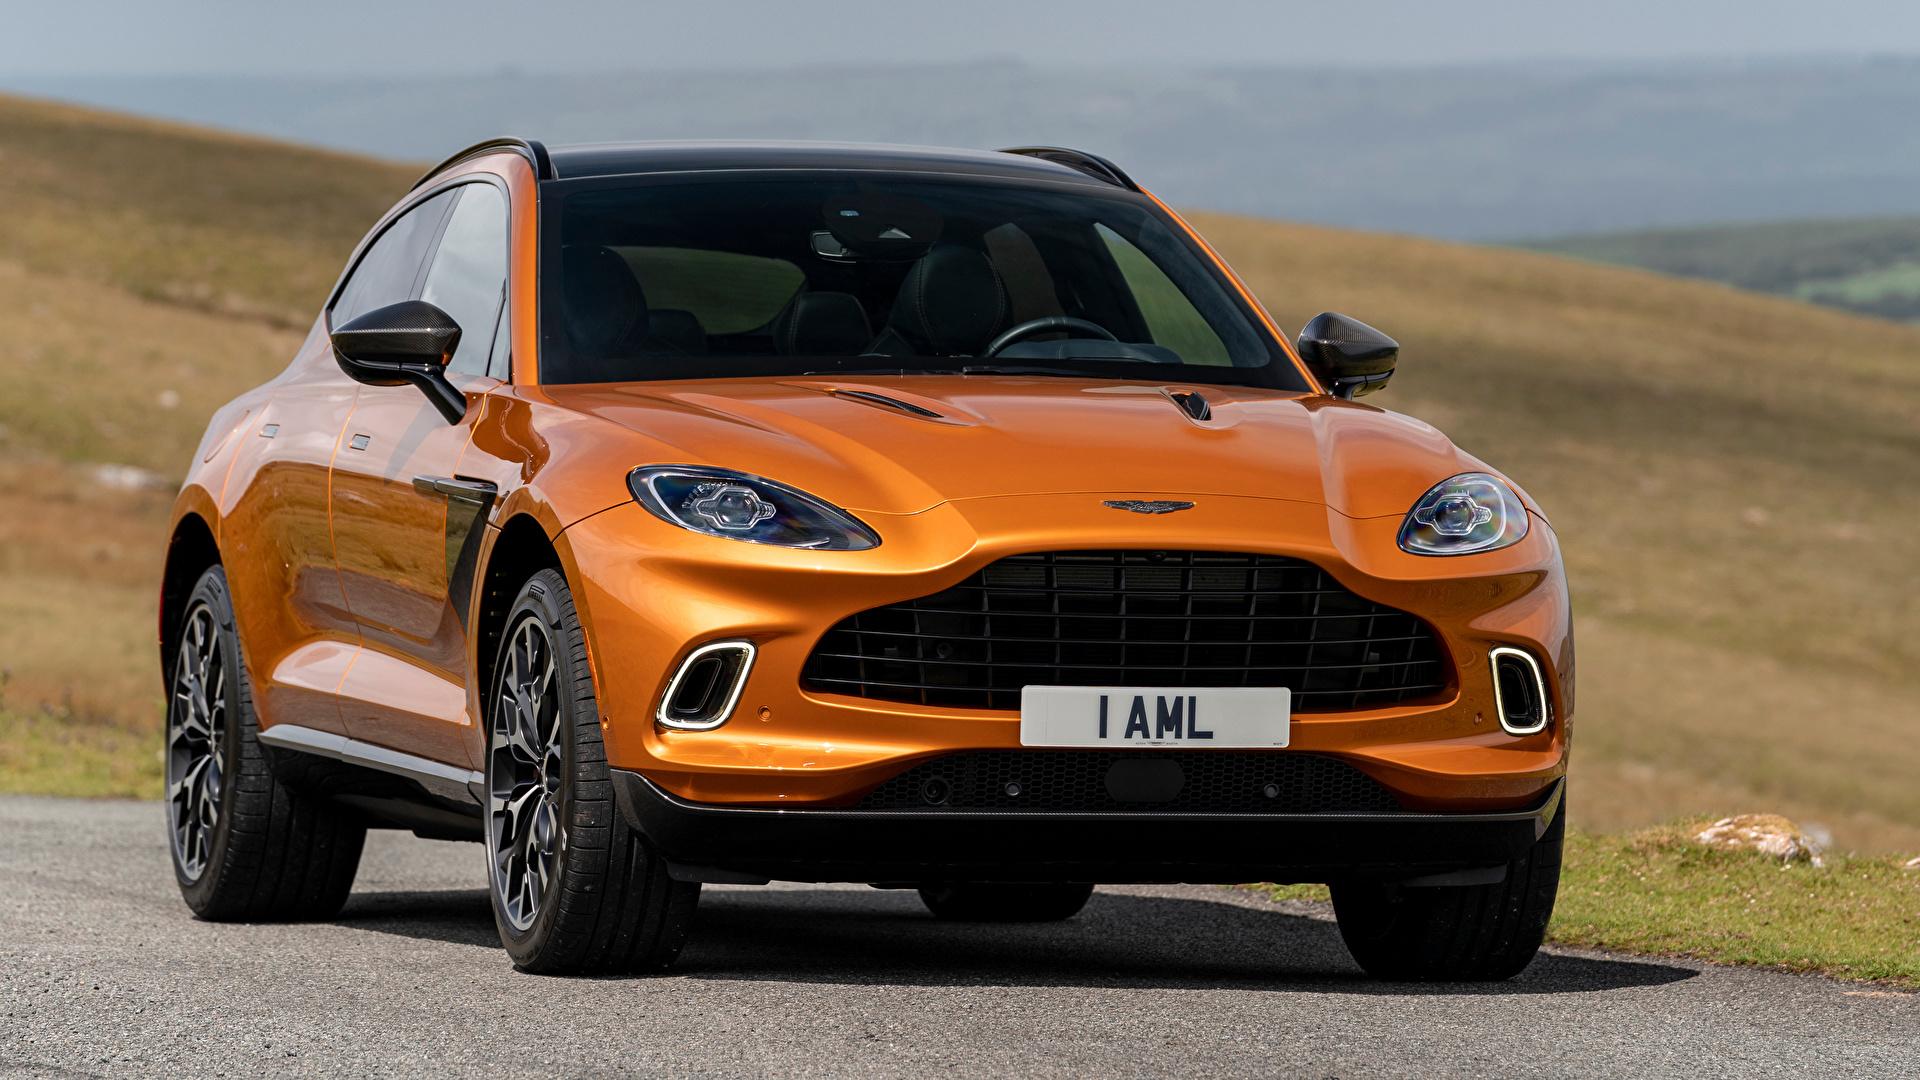 Фотографии Aston Martin Кроссовер DBX, North America, 2020 оранжевая авто Спереди Металлик 1920x1080 Астон мартин CUV Оранжевый оранжевые оранжевых машина машины Автомобили автомобиль